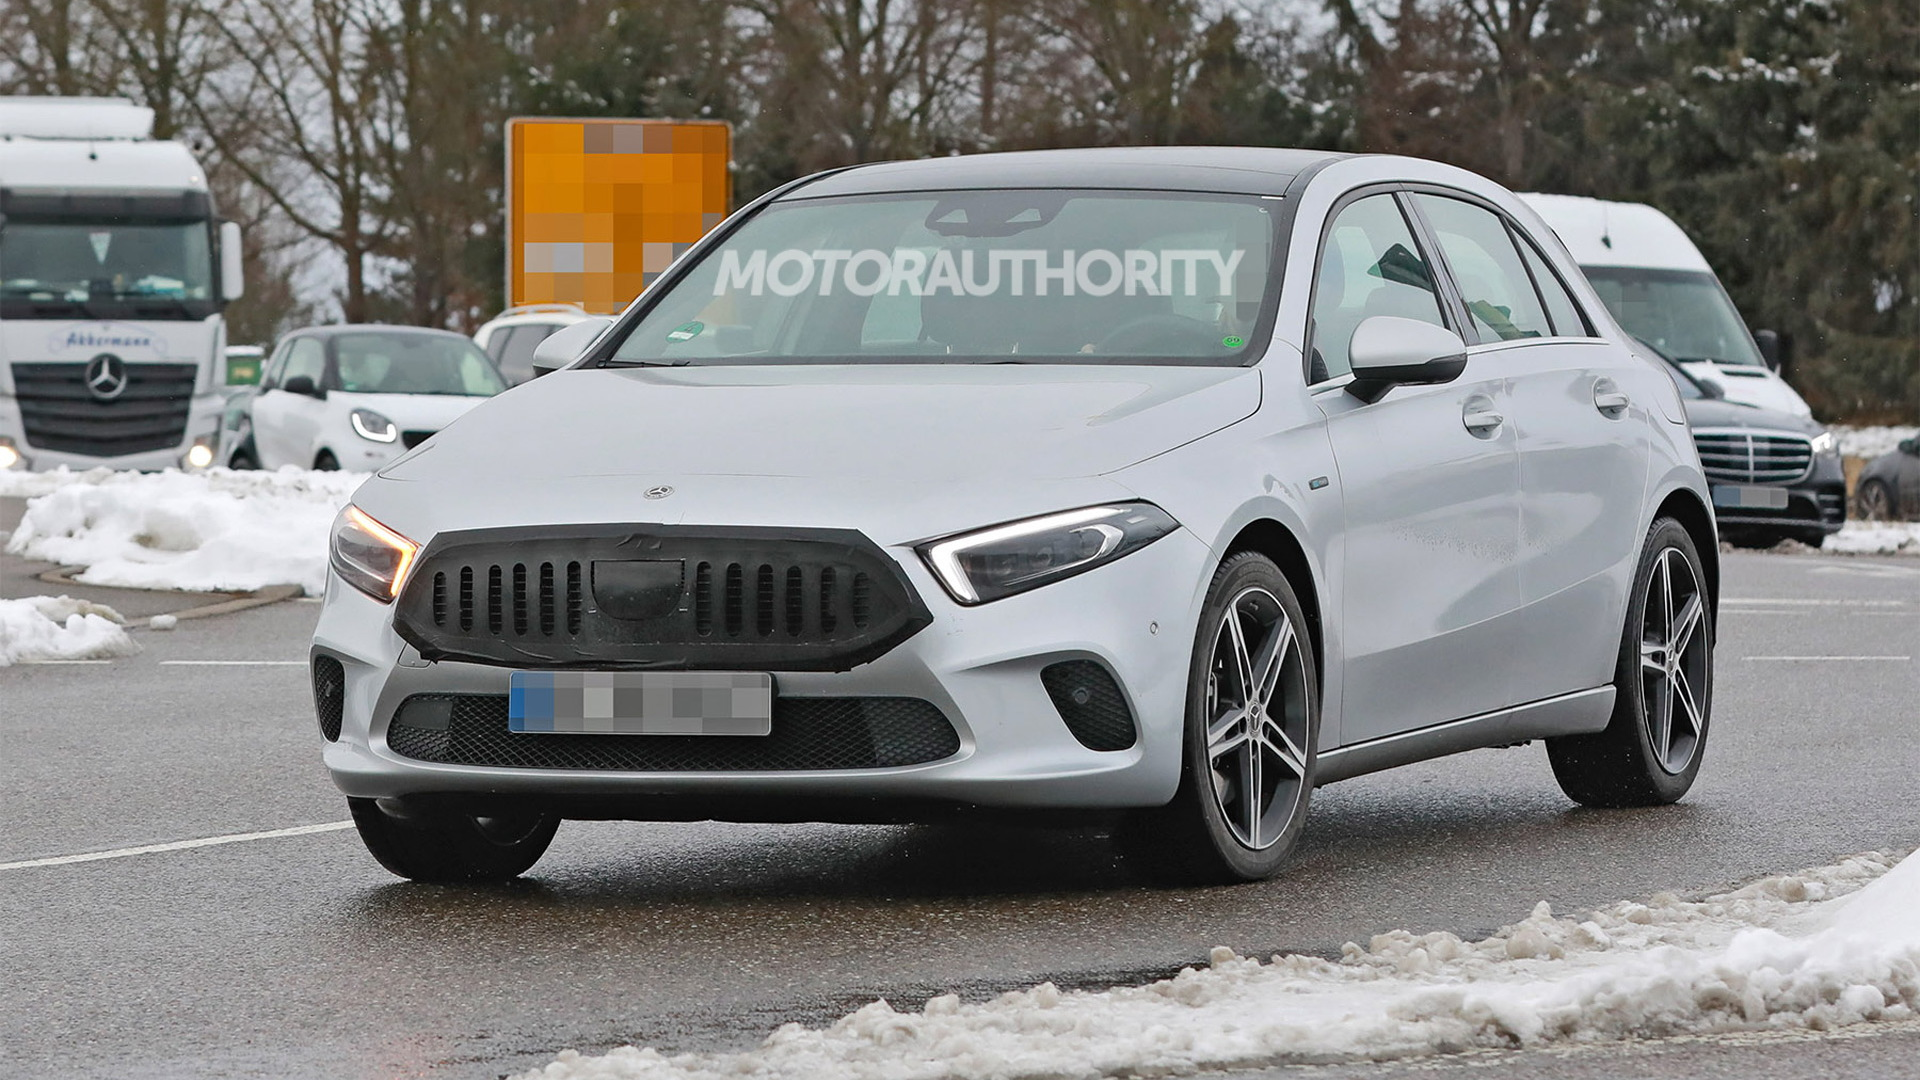 2023 Mercedes-Benz A-Class hatchback facelift spy shots - Photo credit:S. Baldauf/SB-Medien